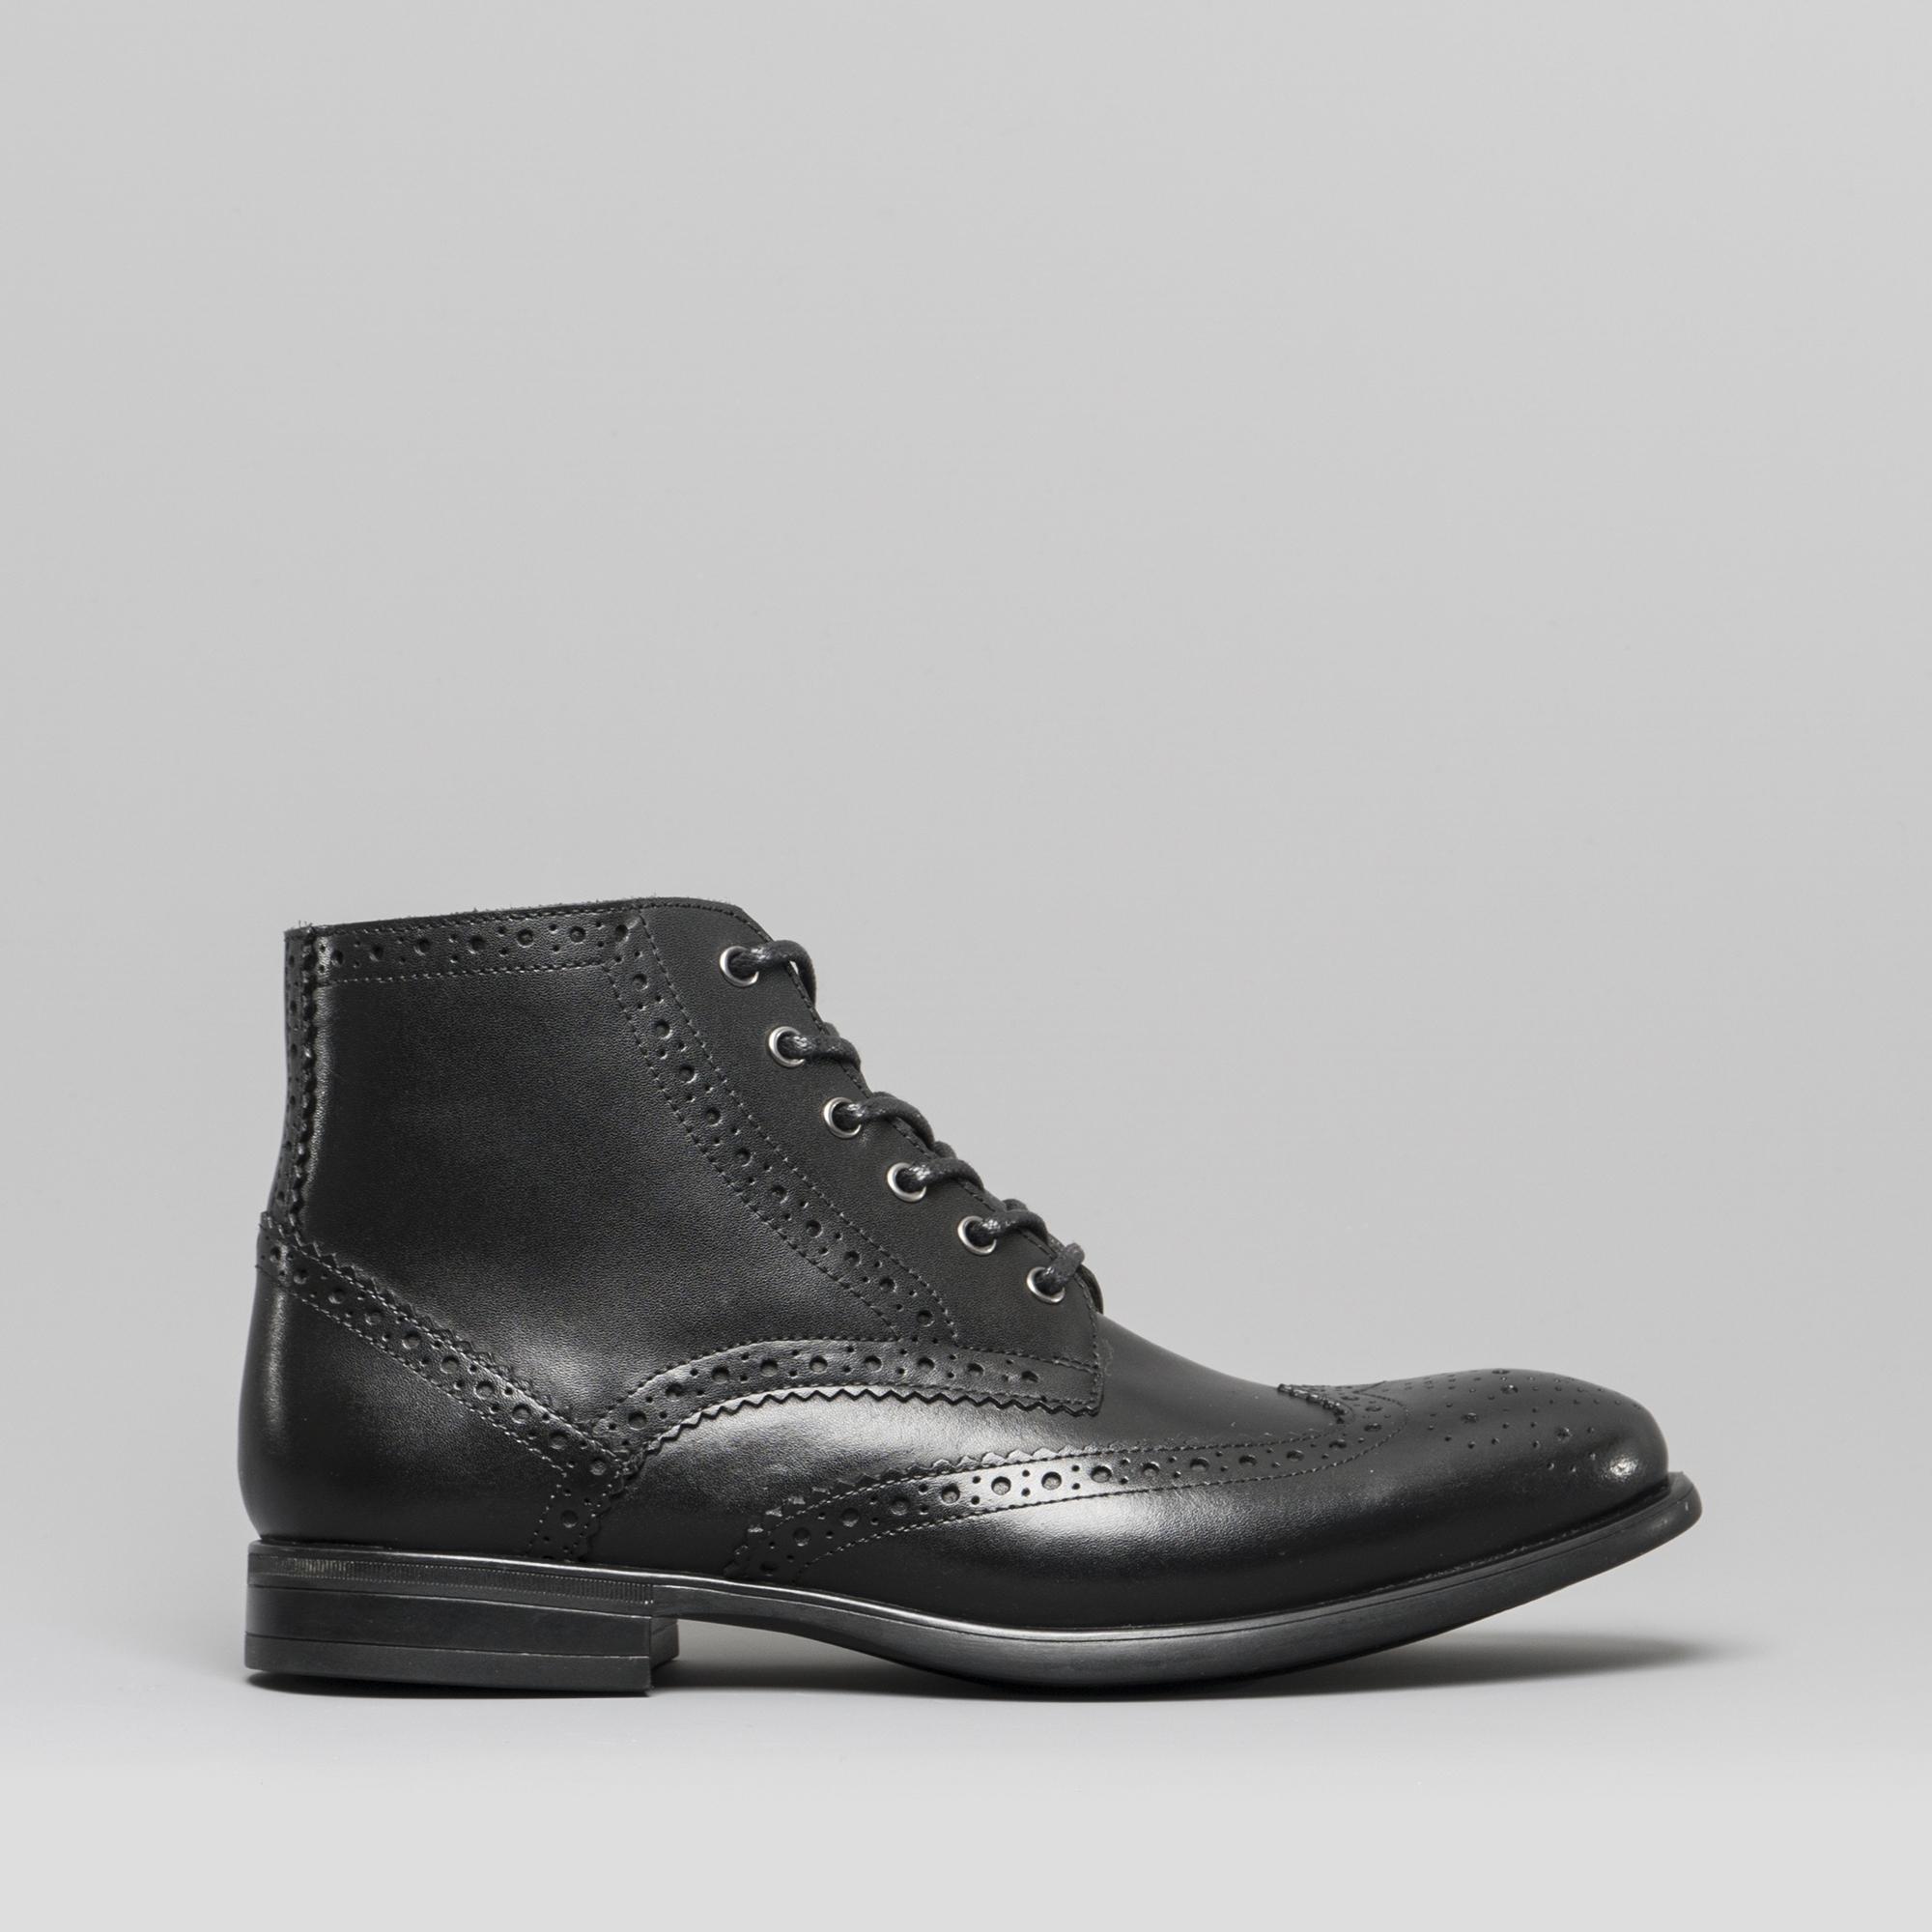 bf102a47ecfa2d Mister Carlo LEONARDO Mens Leather Brogue Ankle Boots Black | Shuperb